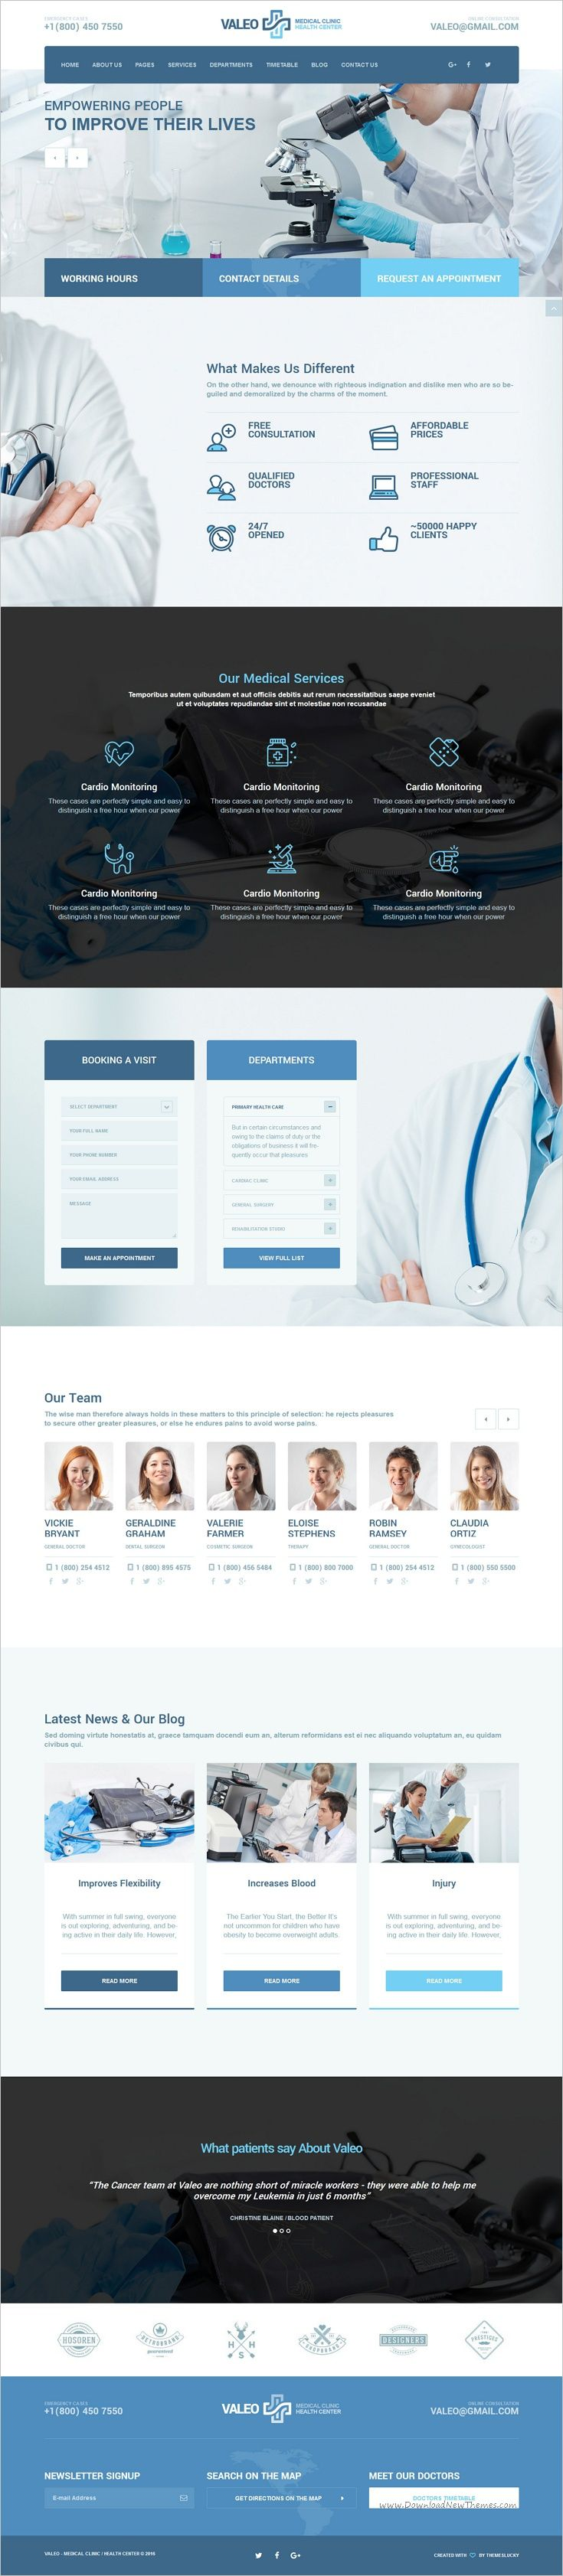 Valeo is a new and modern design responsive #WordPress template for #medical centers, #clinics, #pharmacy website download now➩ https://themeforest.net/item/valeo-health-center-clinic-hospital-wordpress-theme/17966071?ref=Datasata